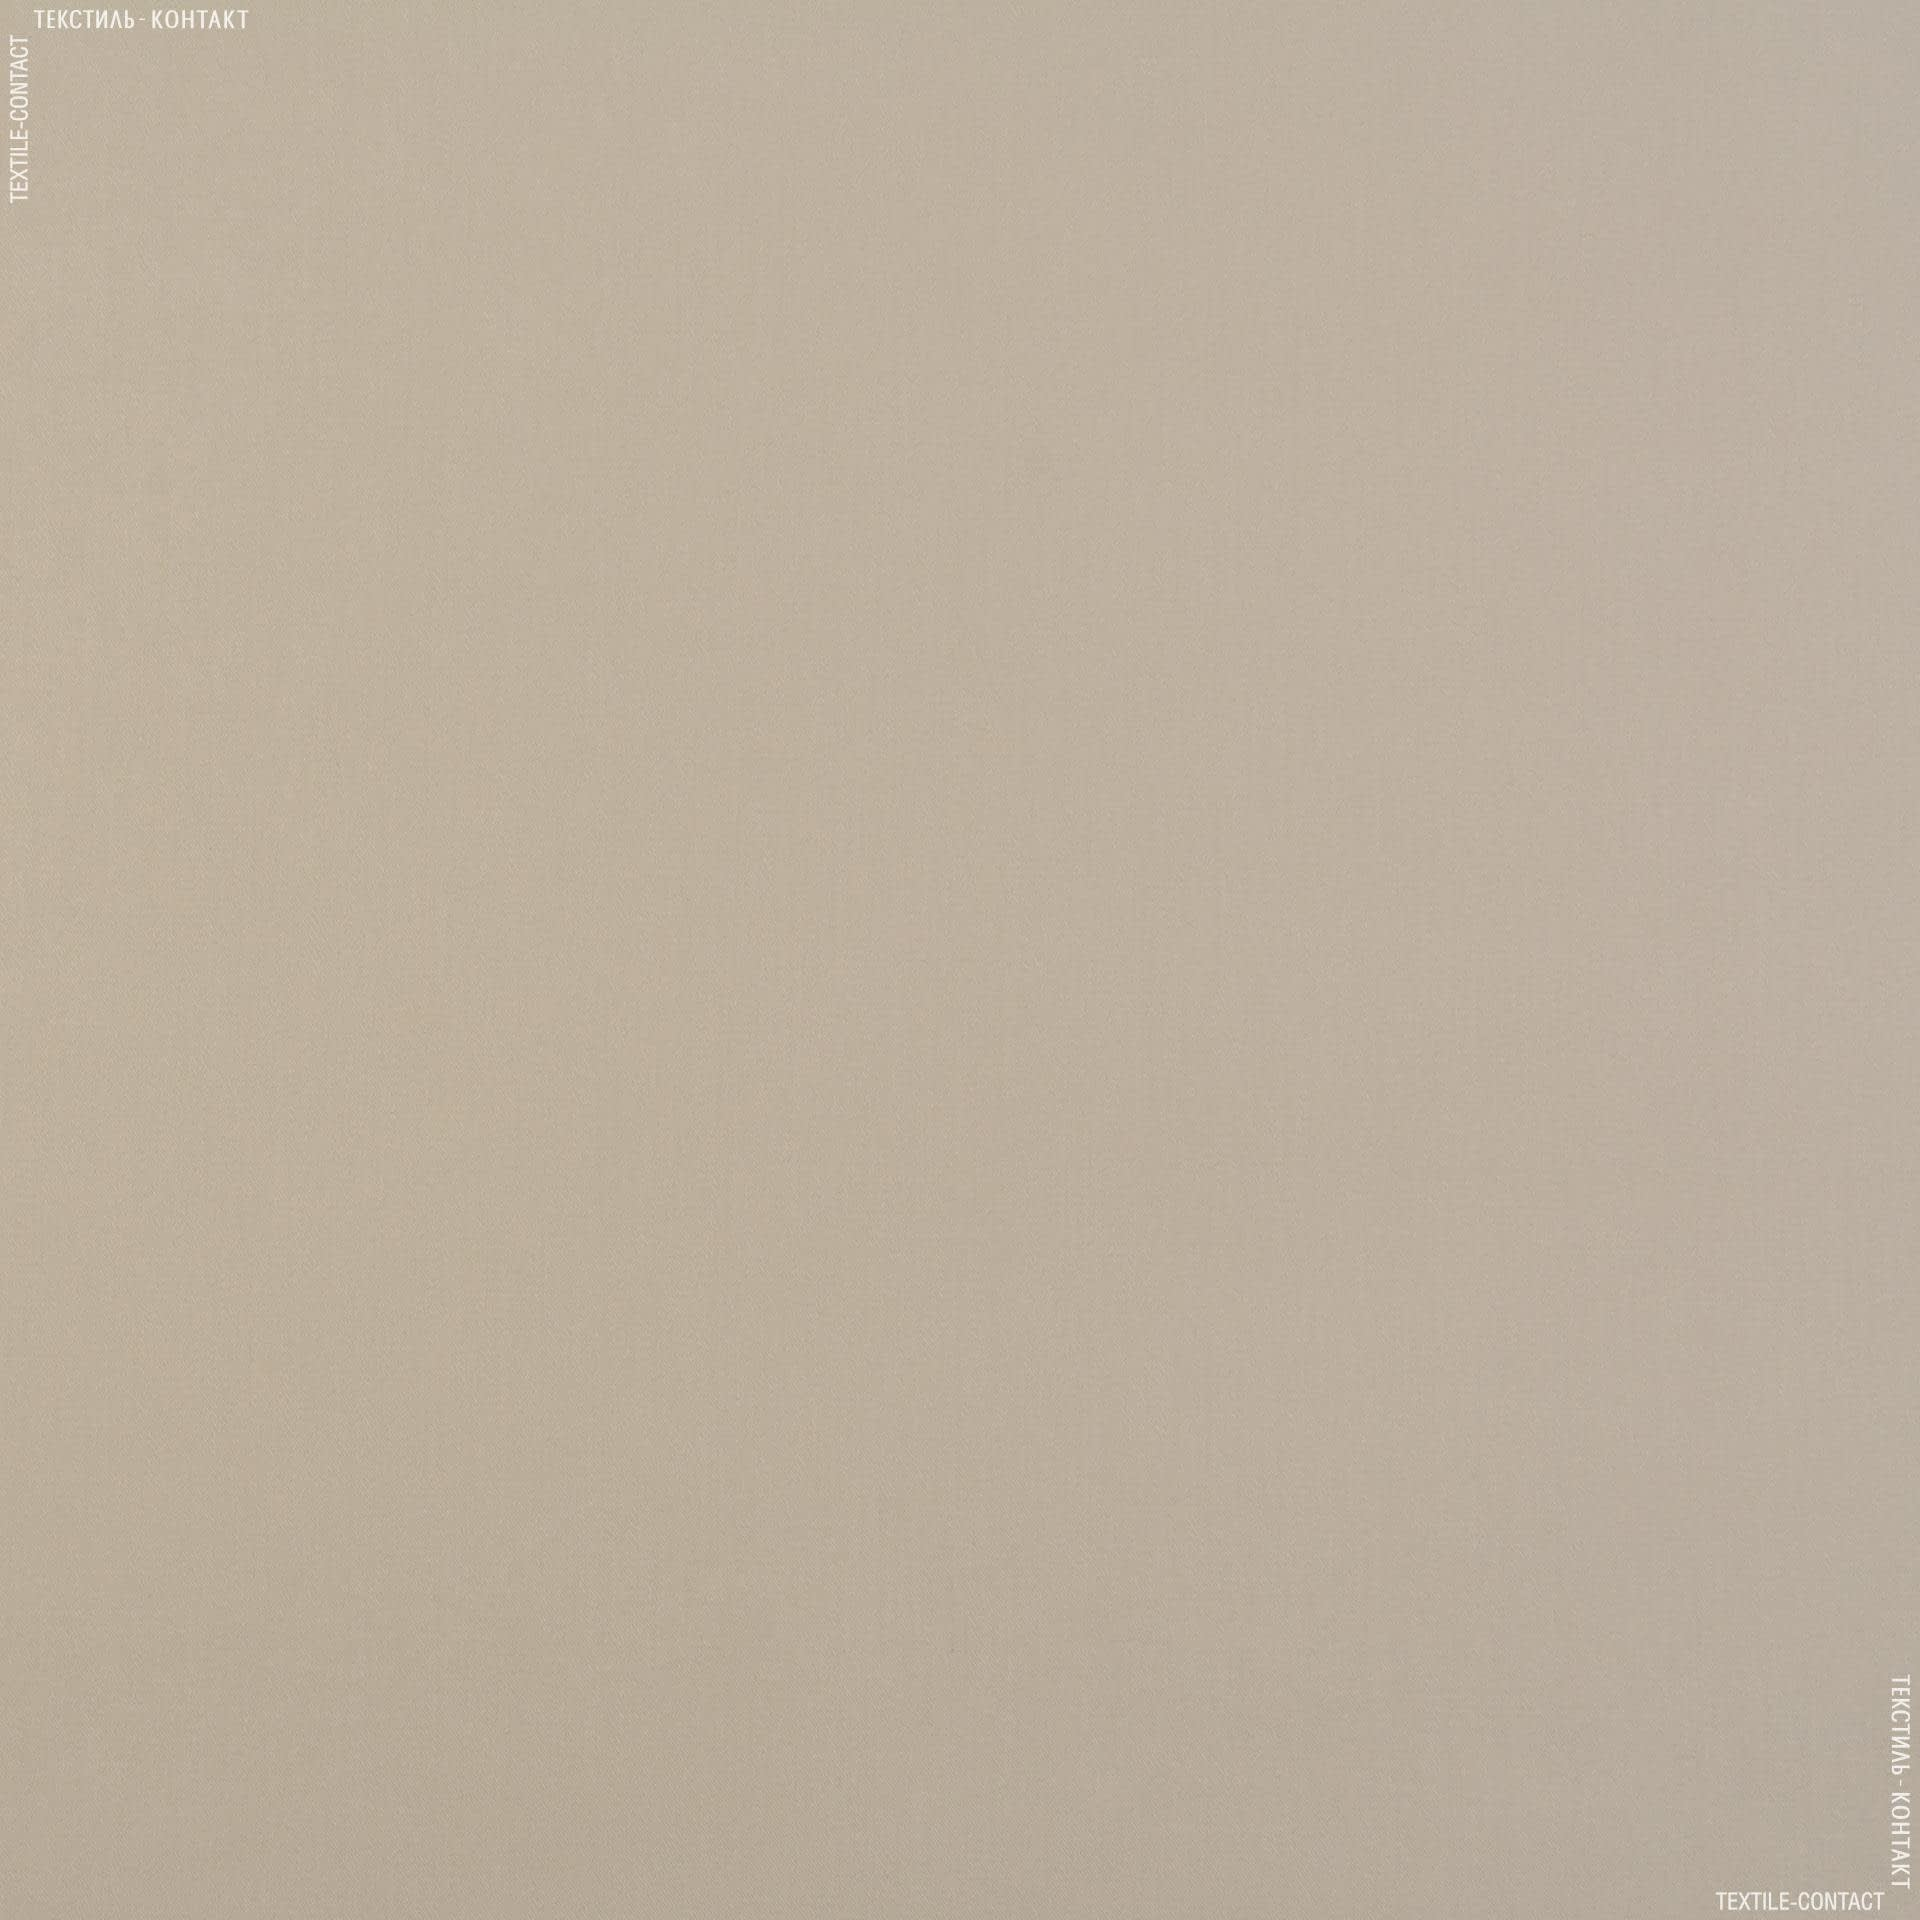 Ткани для брюк - Коттон-мод сатин бежевый